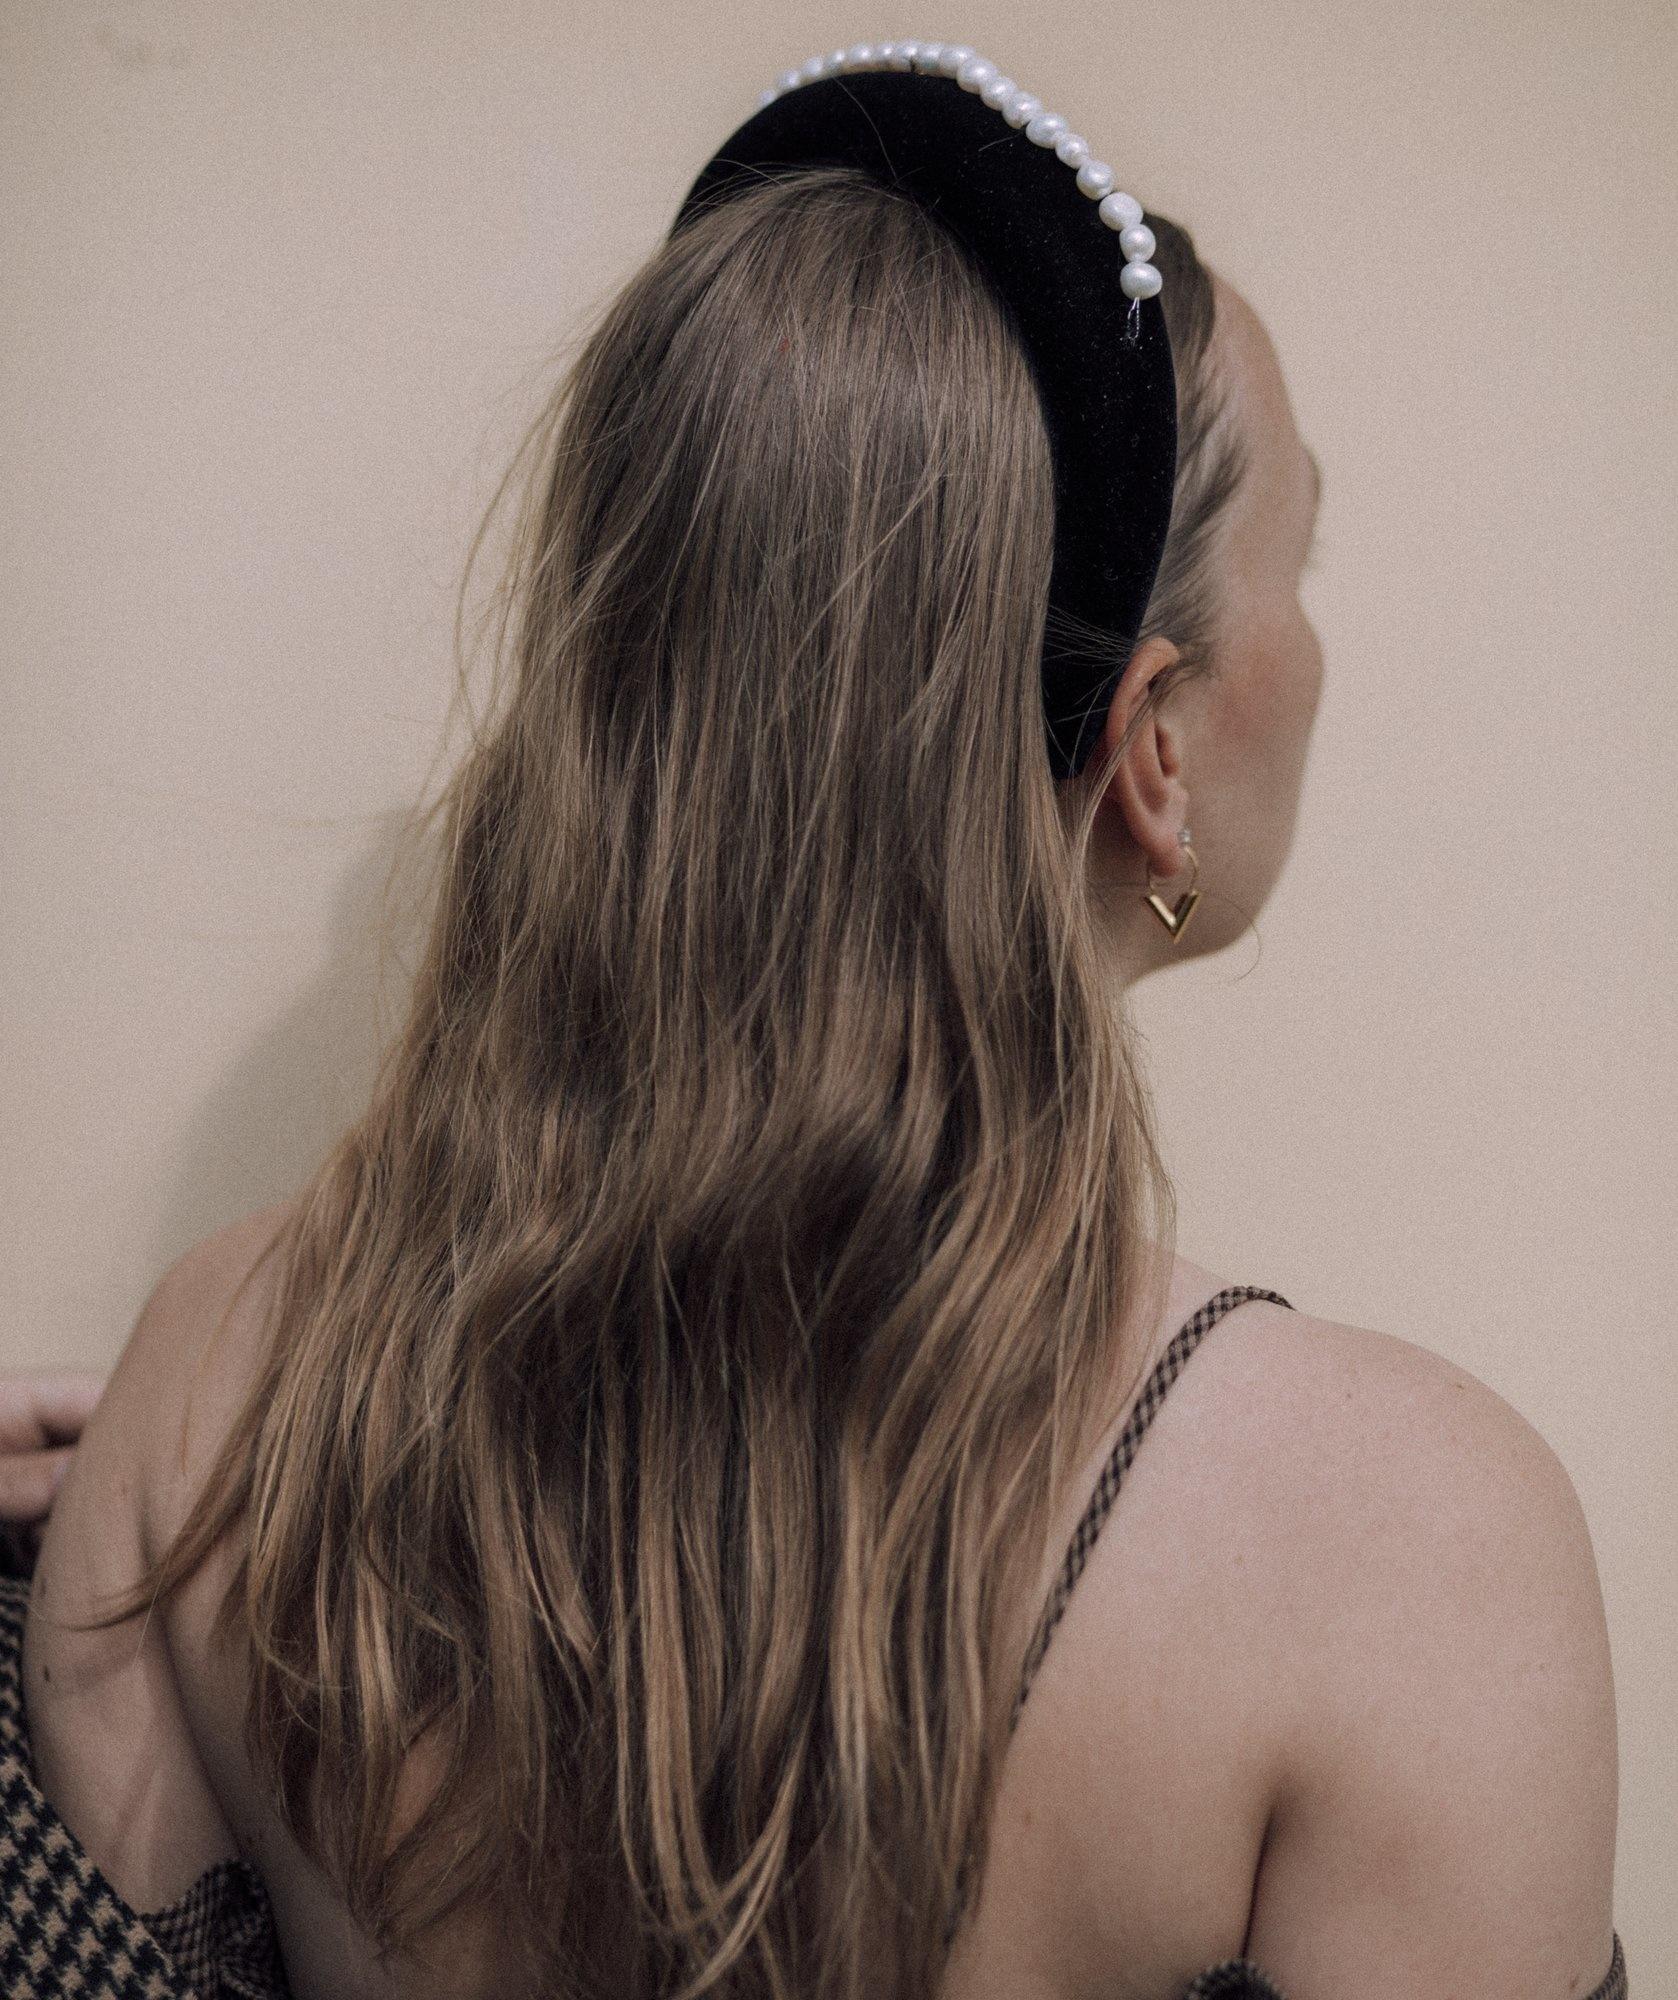 Wald Berlin Lady Di Black Velvet Headband, with Pearls